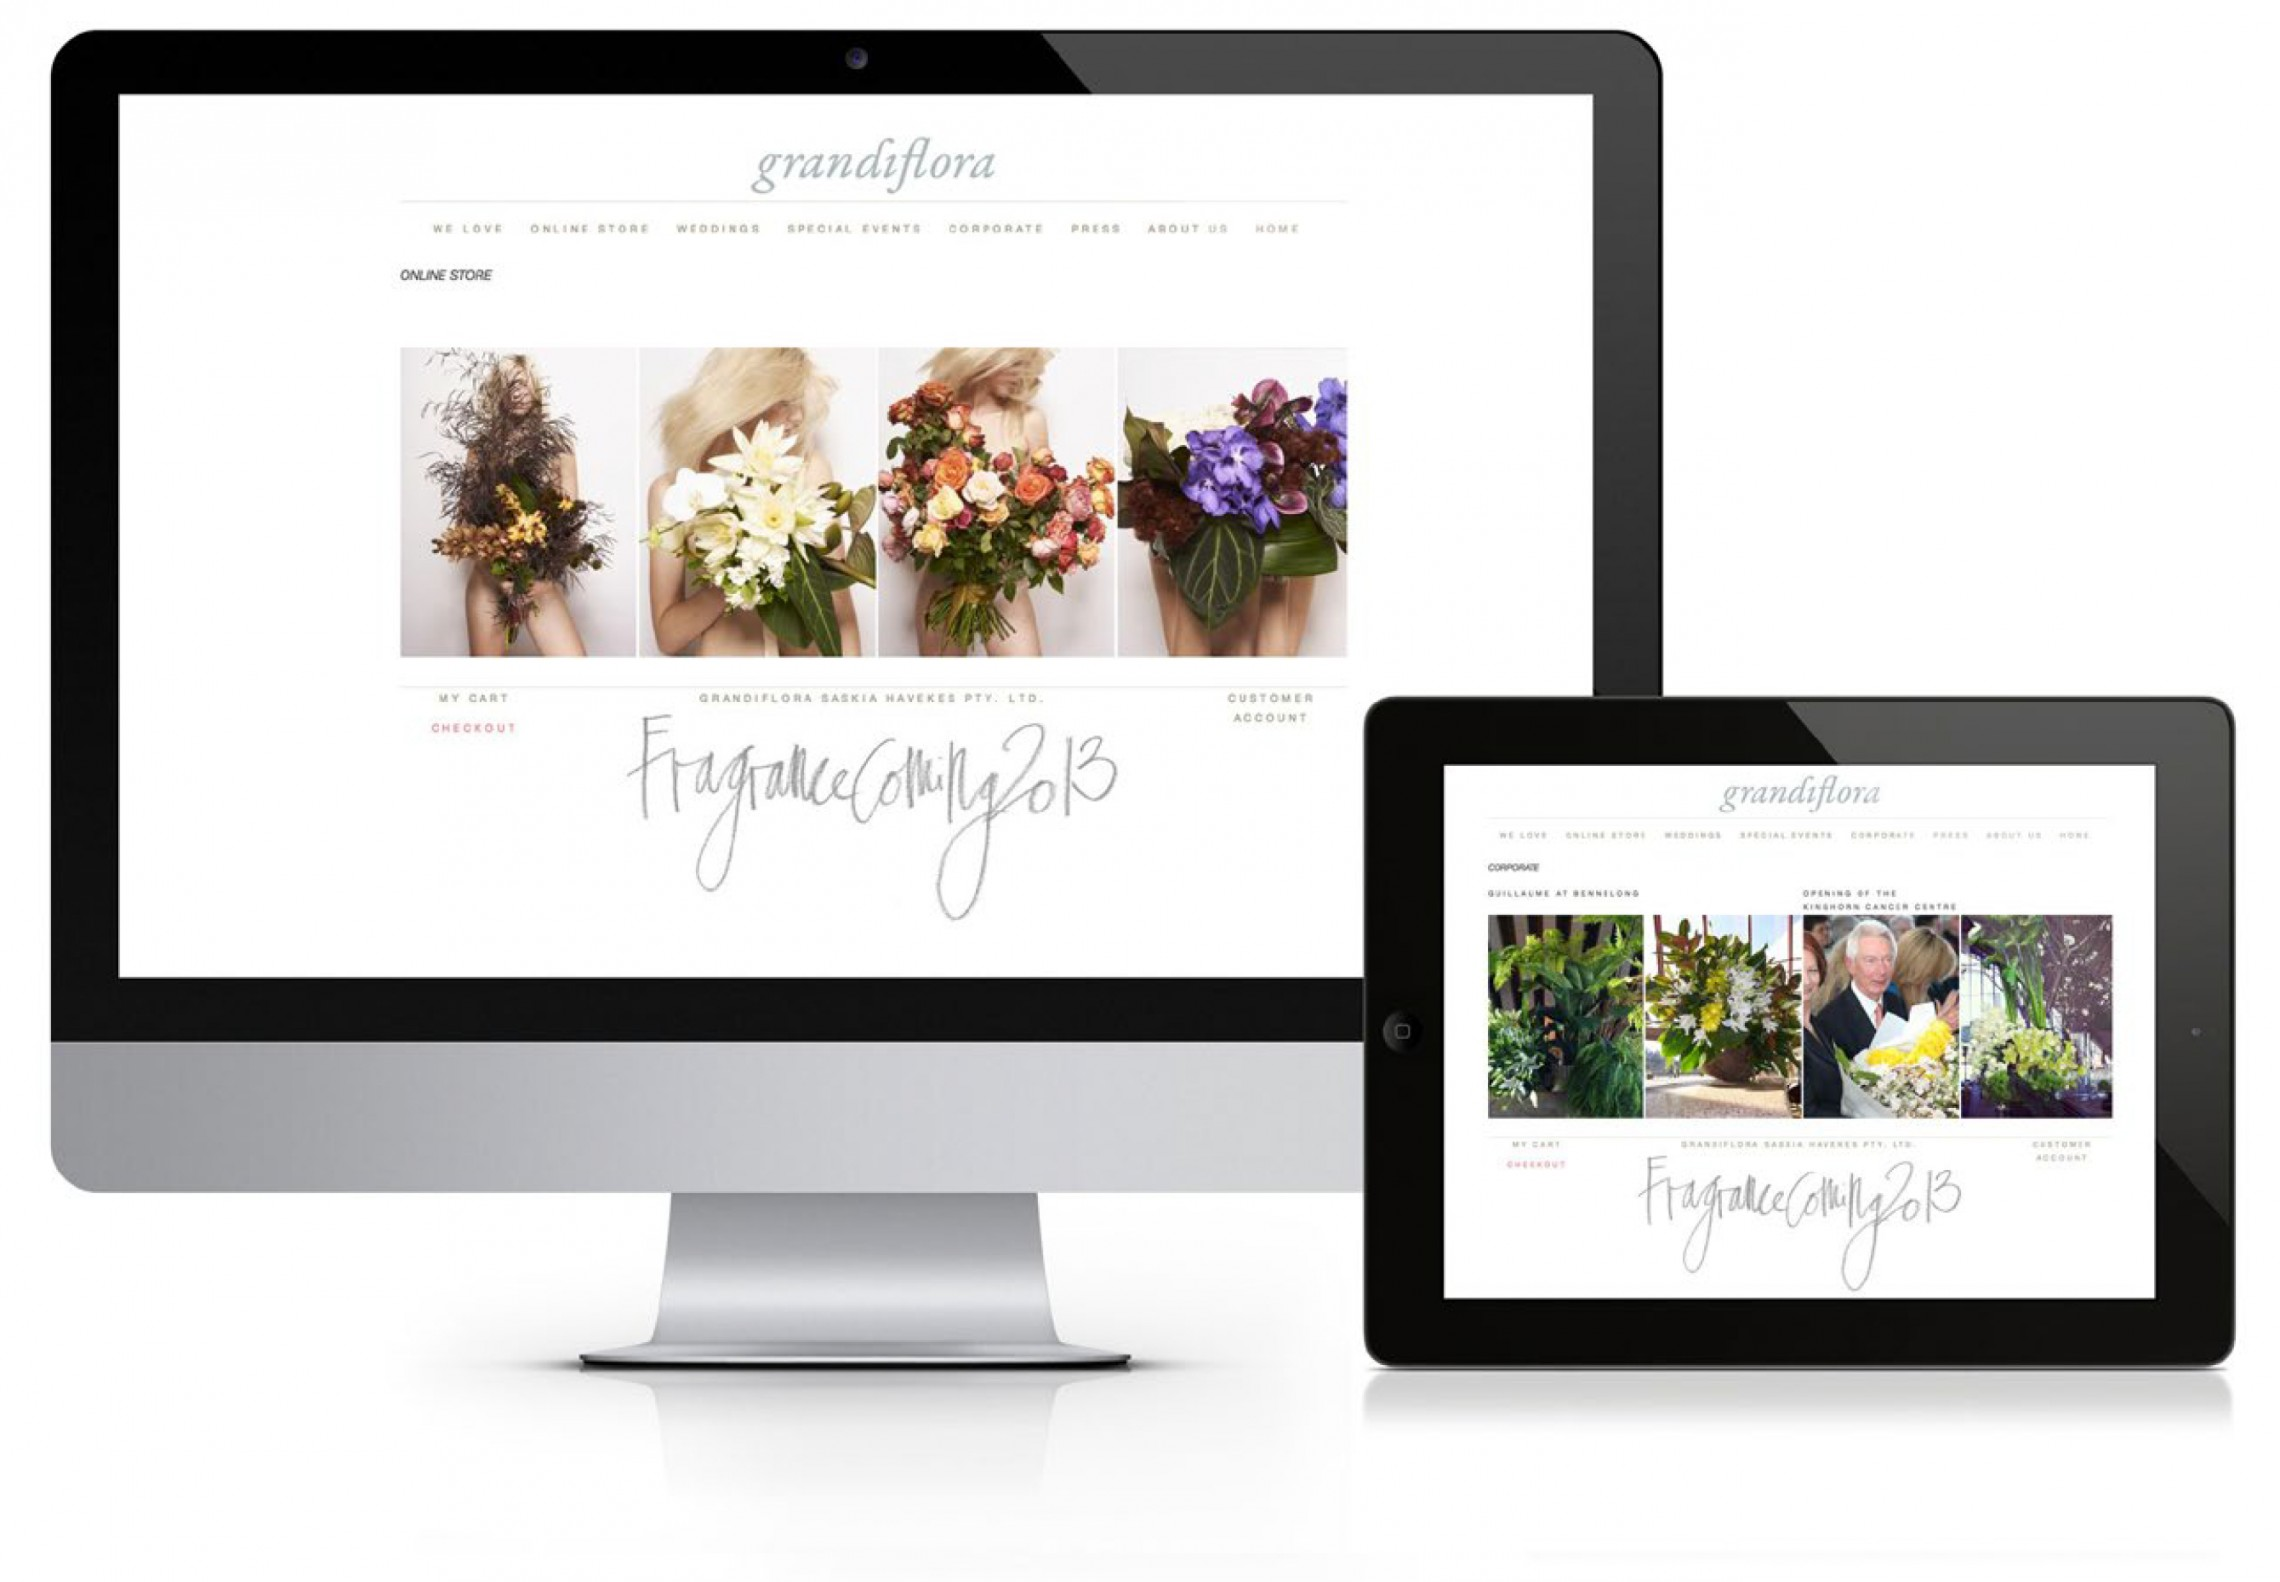 Grandiflora Website